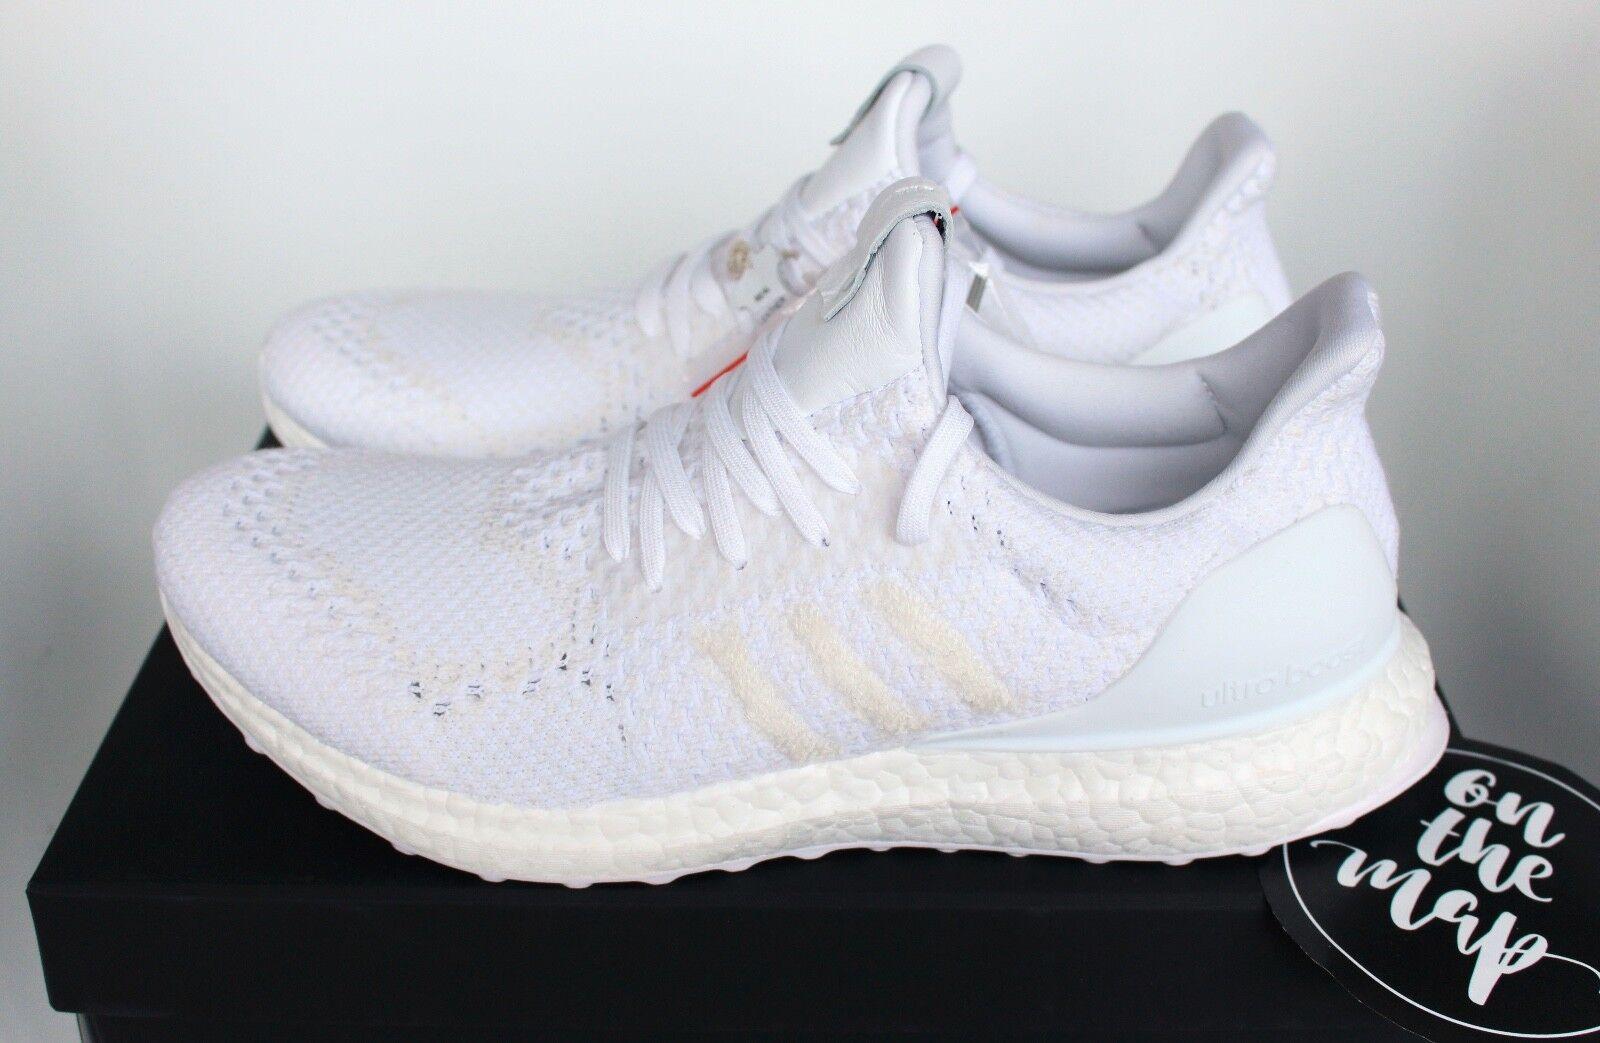 Adidas Consortium A Ma Maniere x Invincible Ultra Boost blanc Wool5 8 9 US